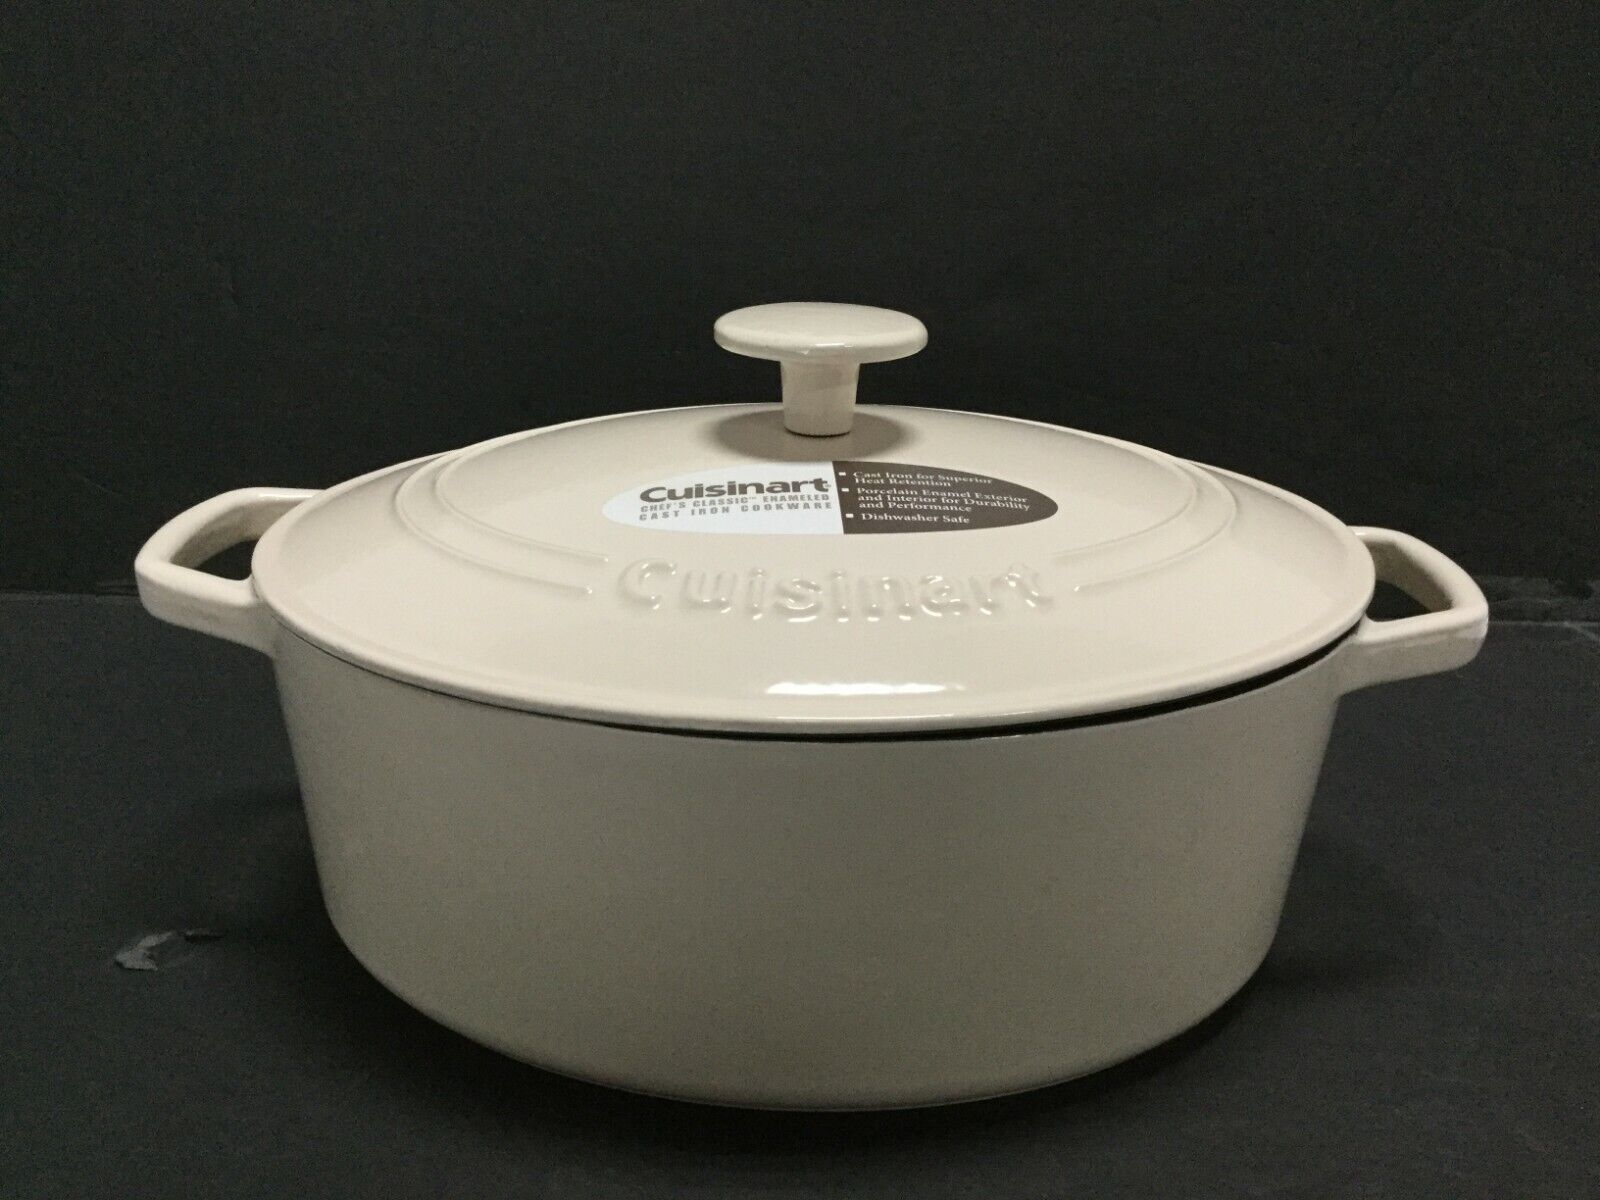 Cuisinart 5.5 Qt. Casserole Cast Iron, Cream